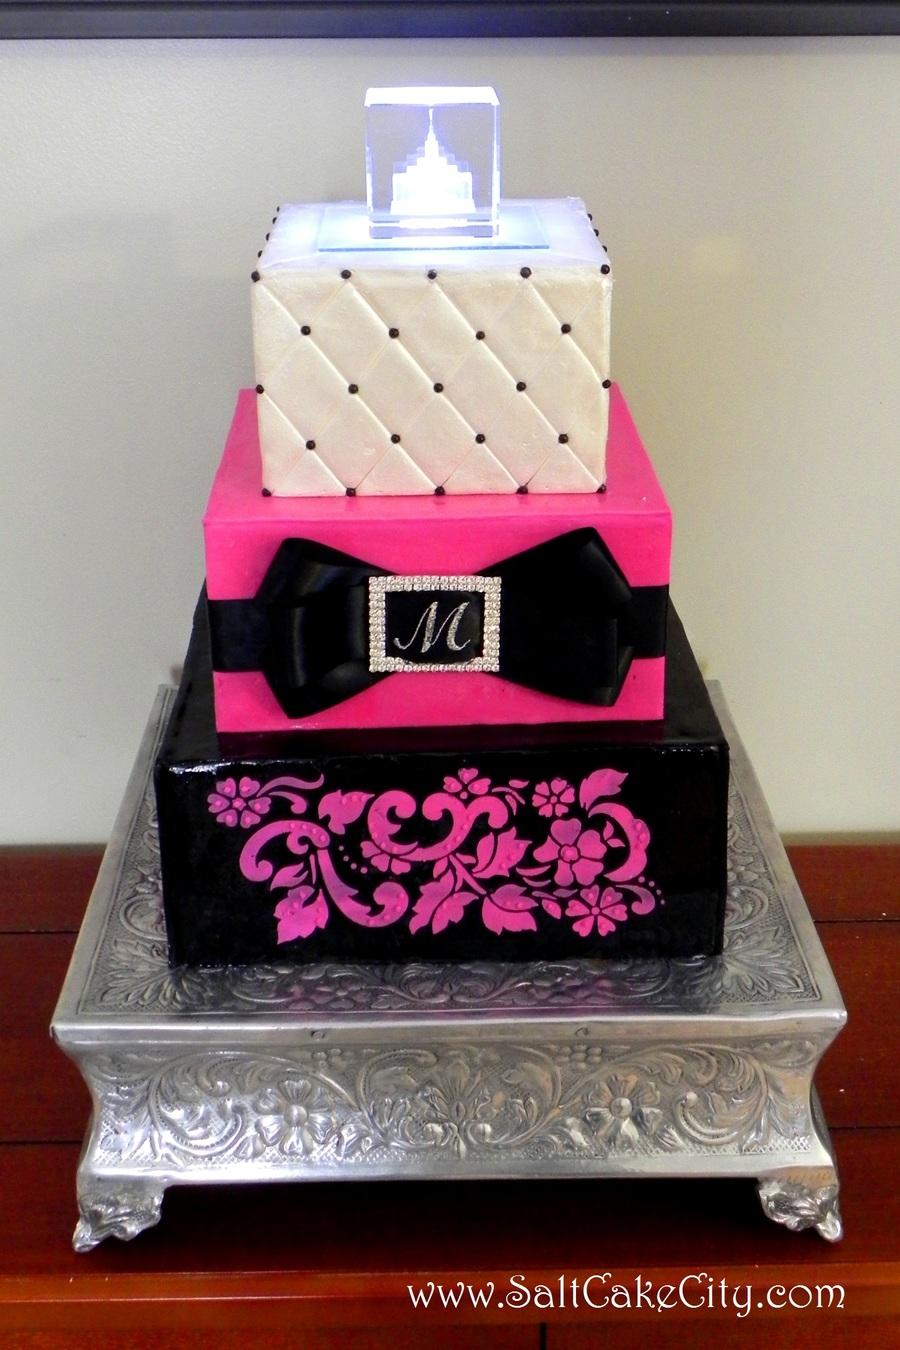 The Sensational Cakes Pink Black Theme Contemporary